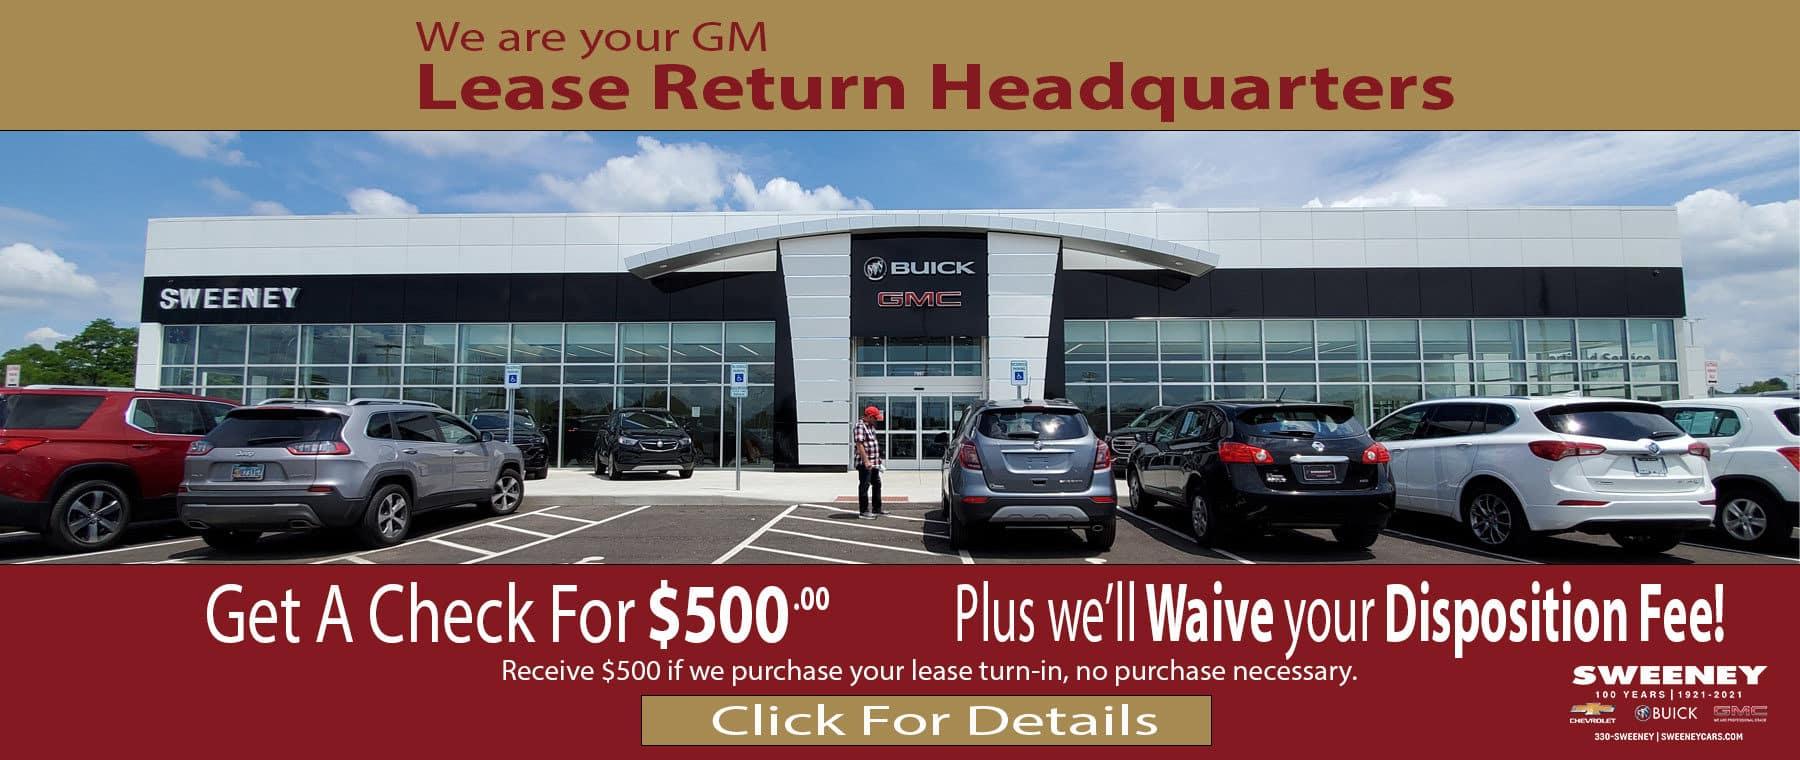 GM Lease Return Headquarters